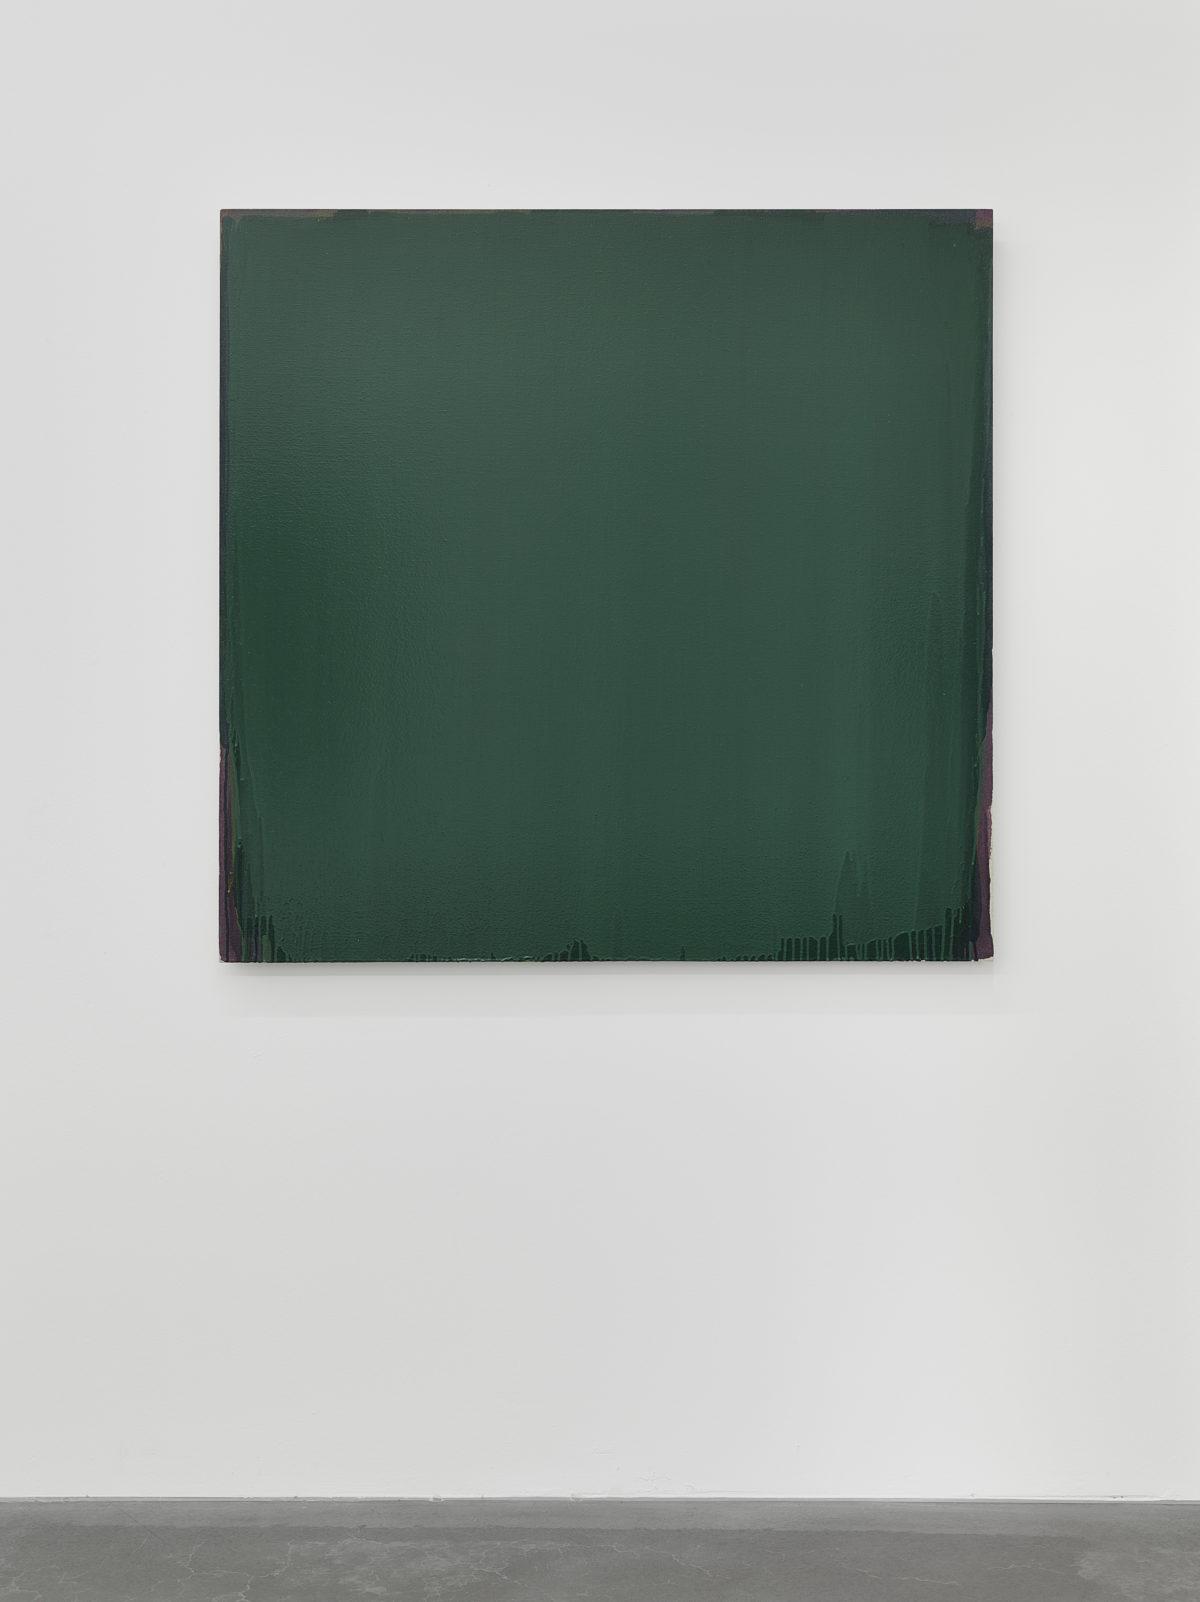 Joseph Marioni, Green Painting, 2006